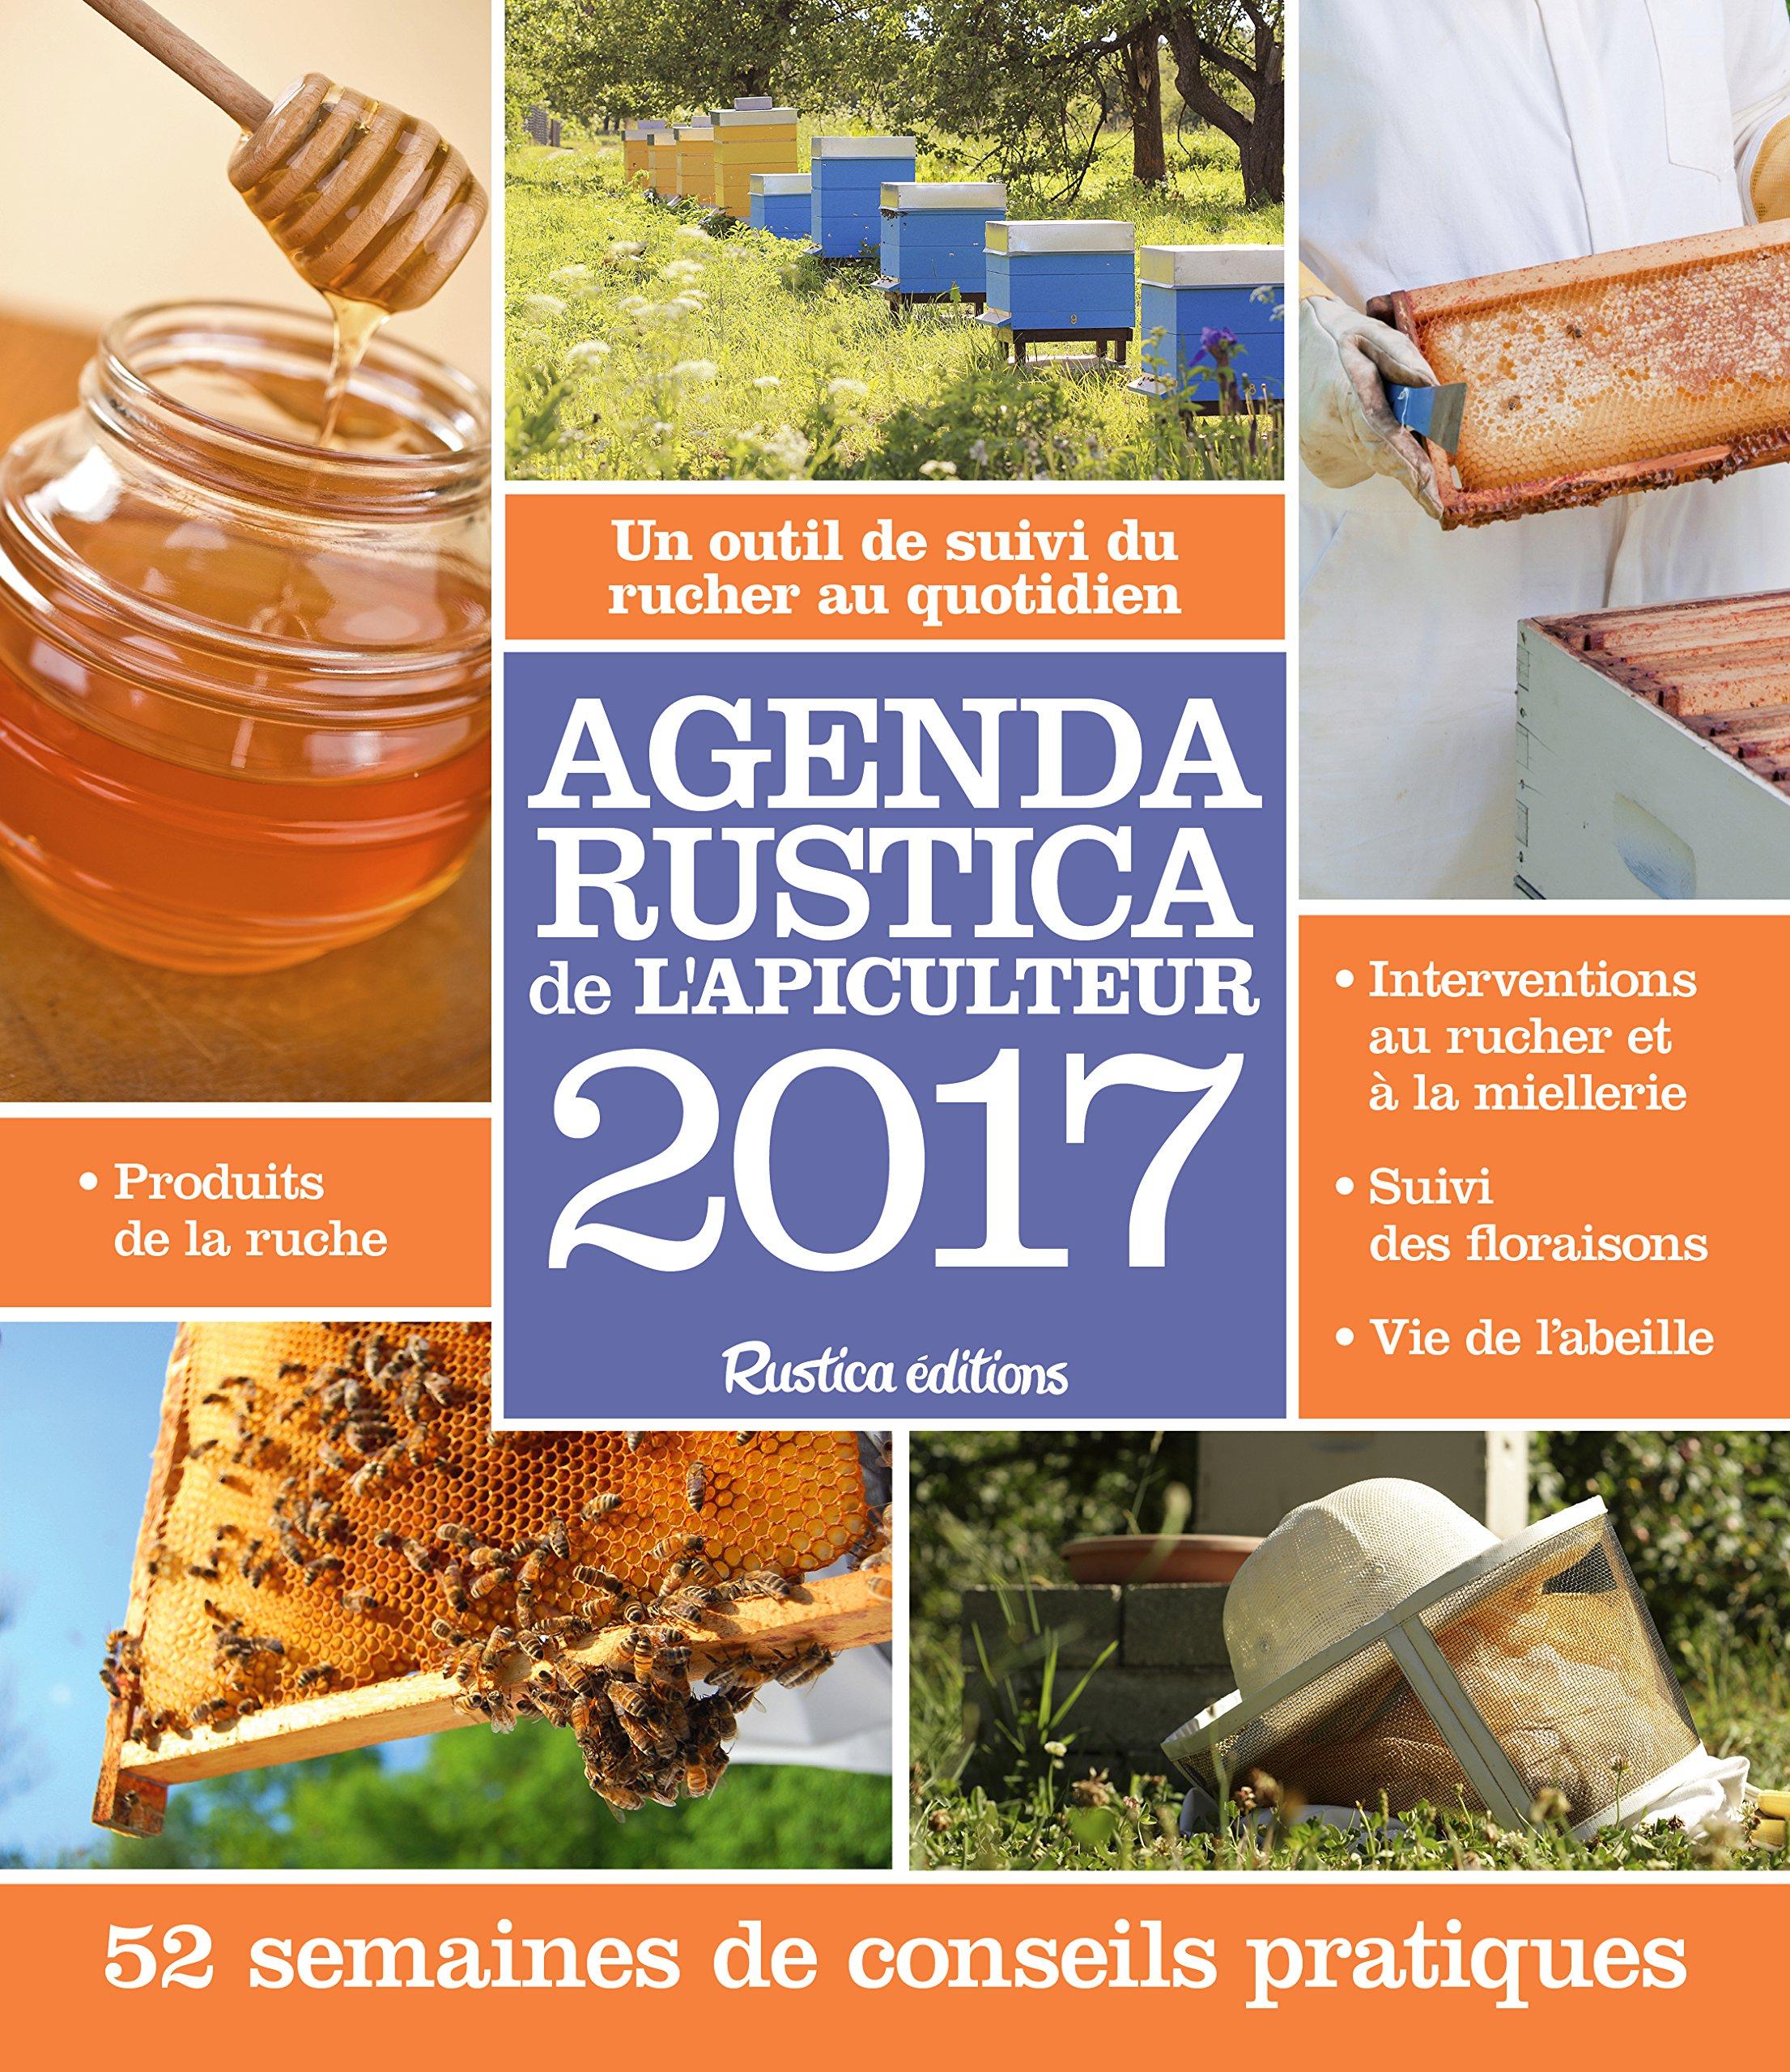 Agenda Rustica de l'apiculteur 2017 Broché – 19 août 2016 Gilles Fert Paul Fert 2815308827 Animaux